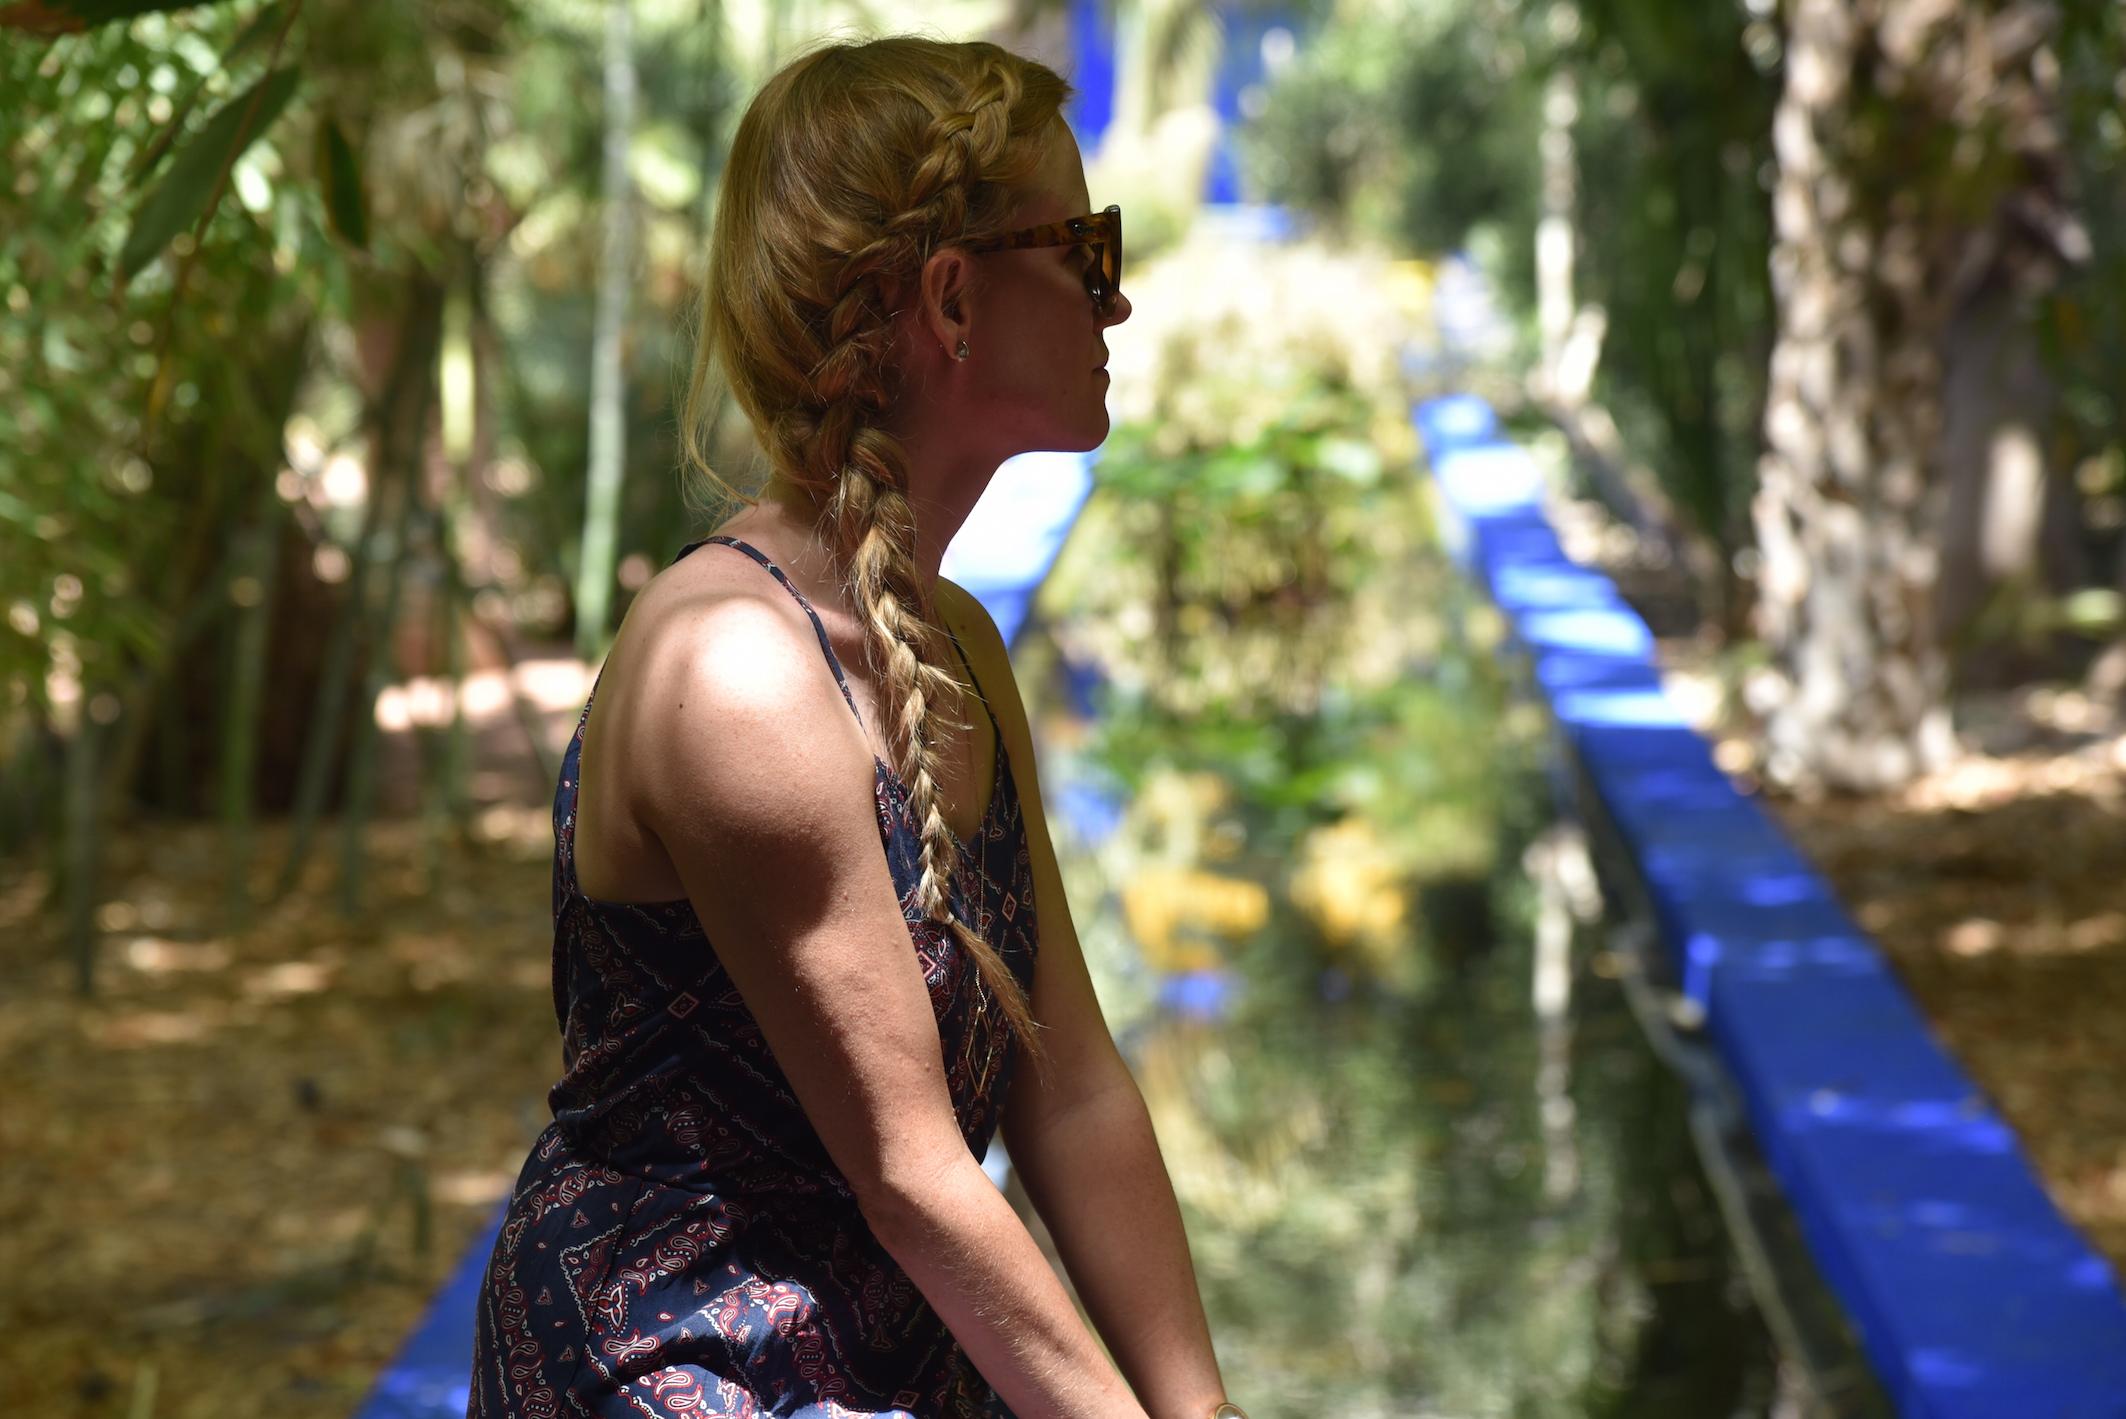 Braid-Hairstyle-OOTDB-Fashion-Blogger-Travel-Morocco-MyBigAppleCity